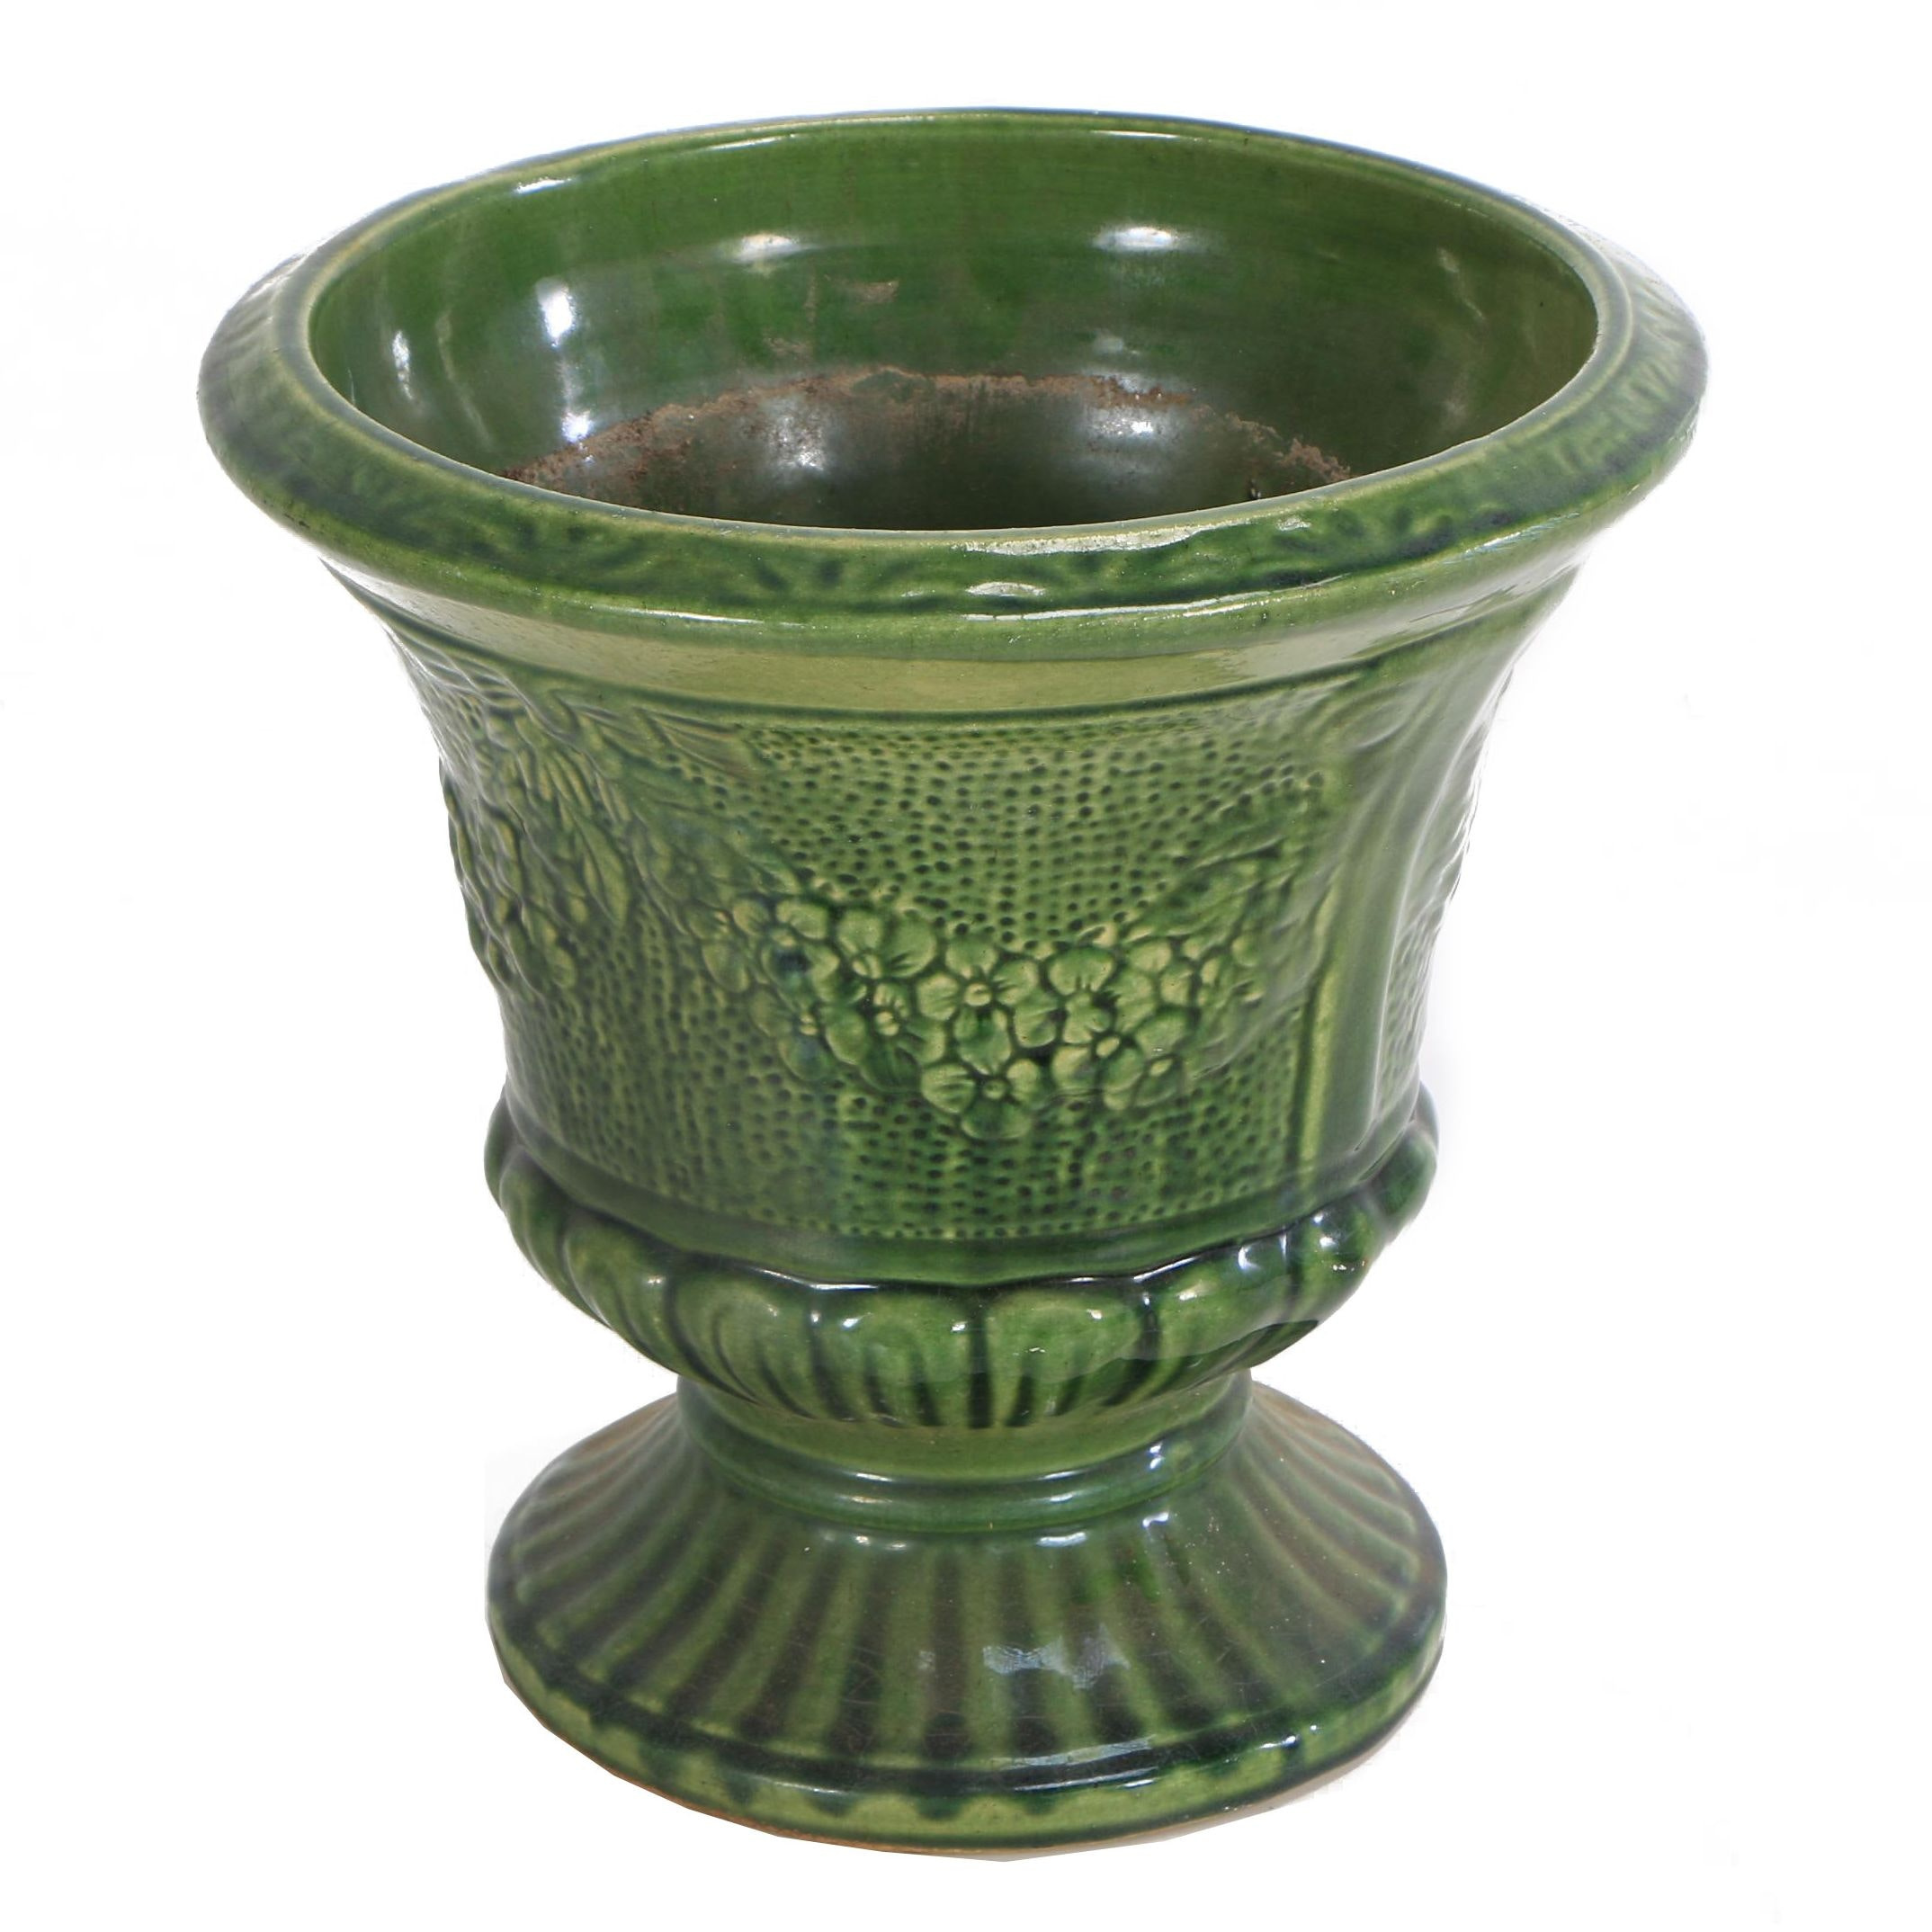 Ceramic Urn Planter with Floral Motif